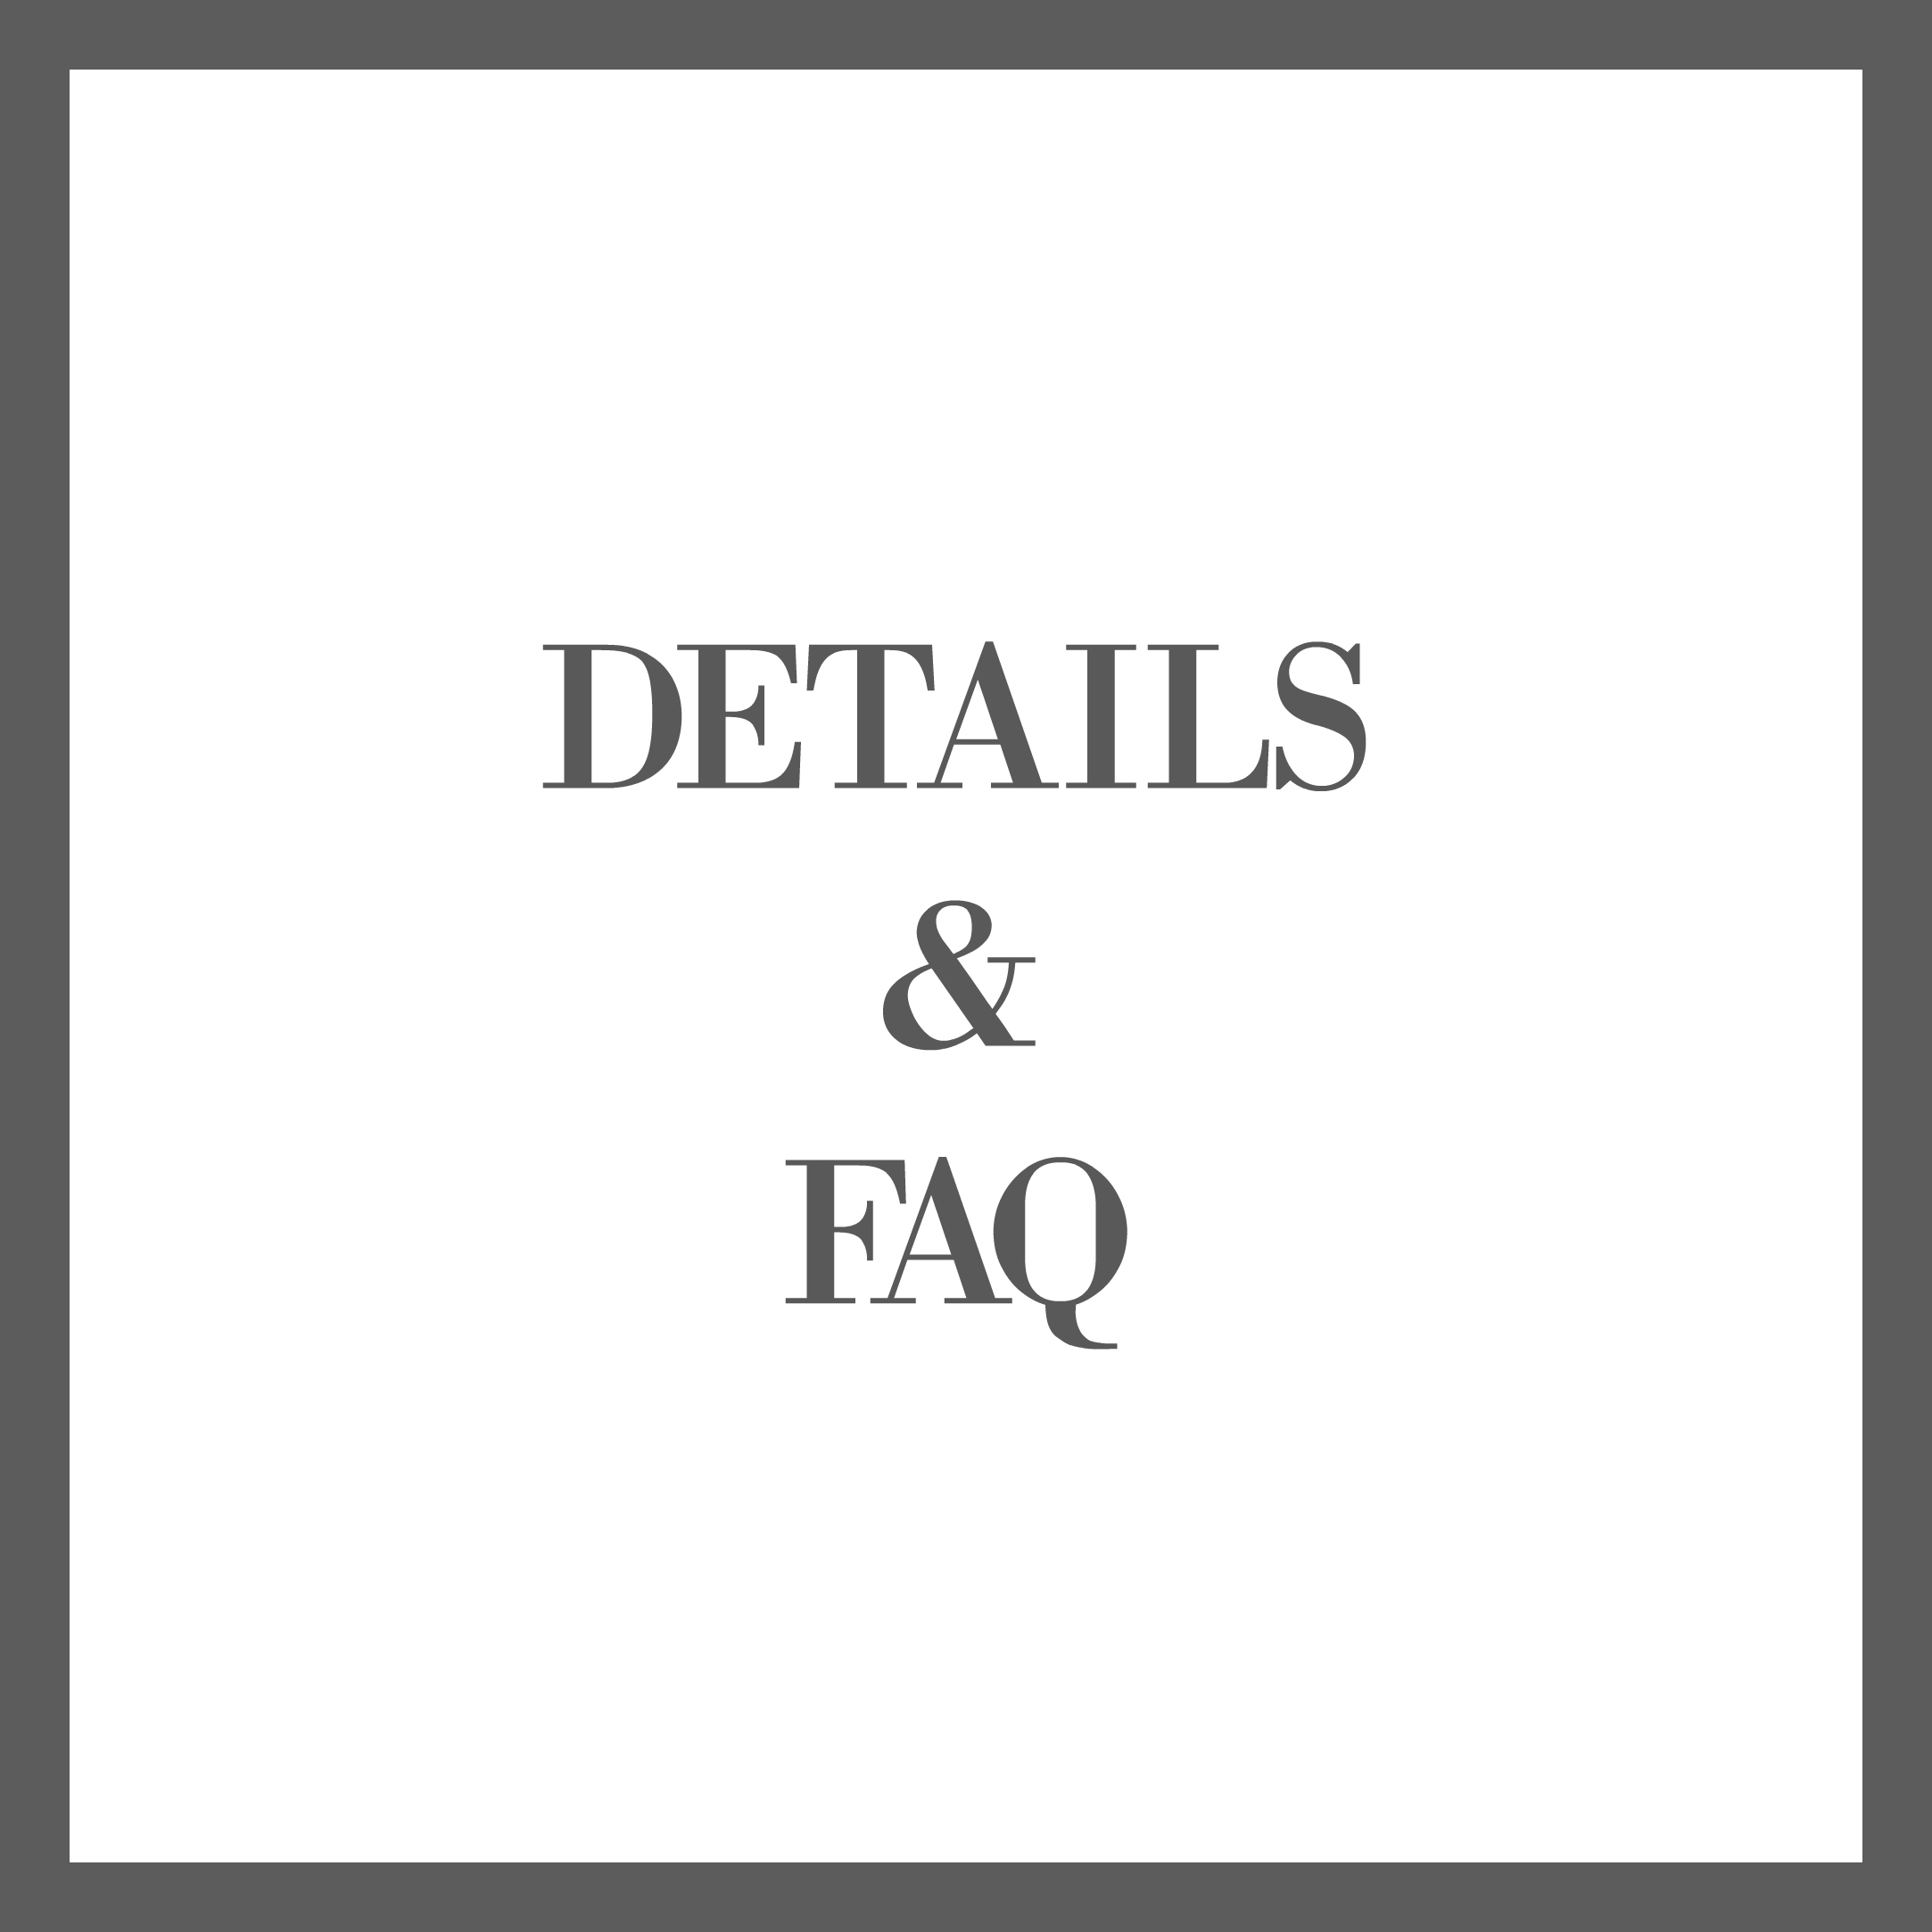 DETAILS AND FAQ.jpg